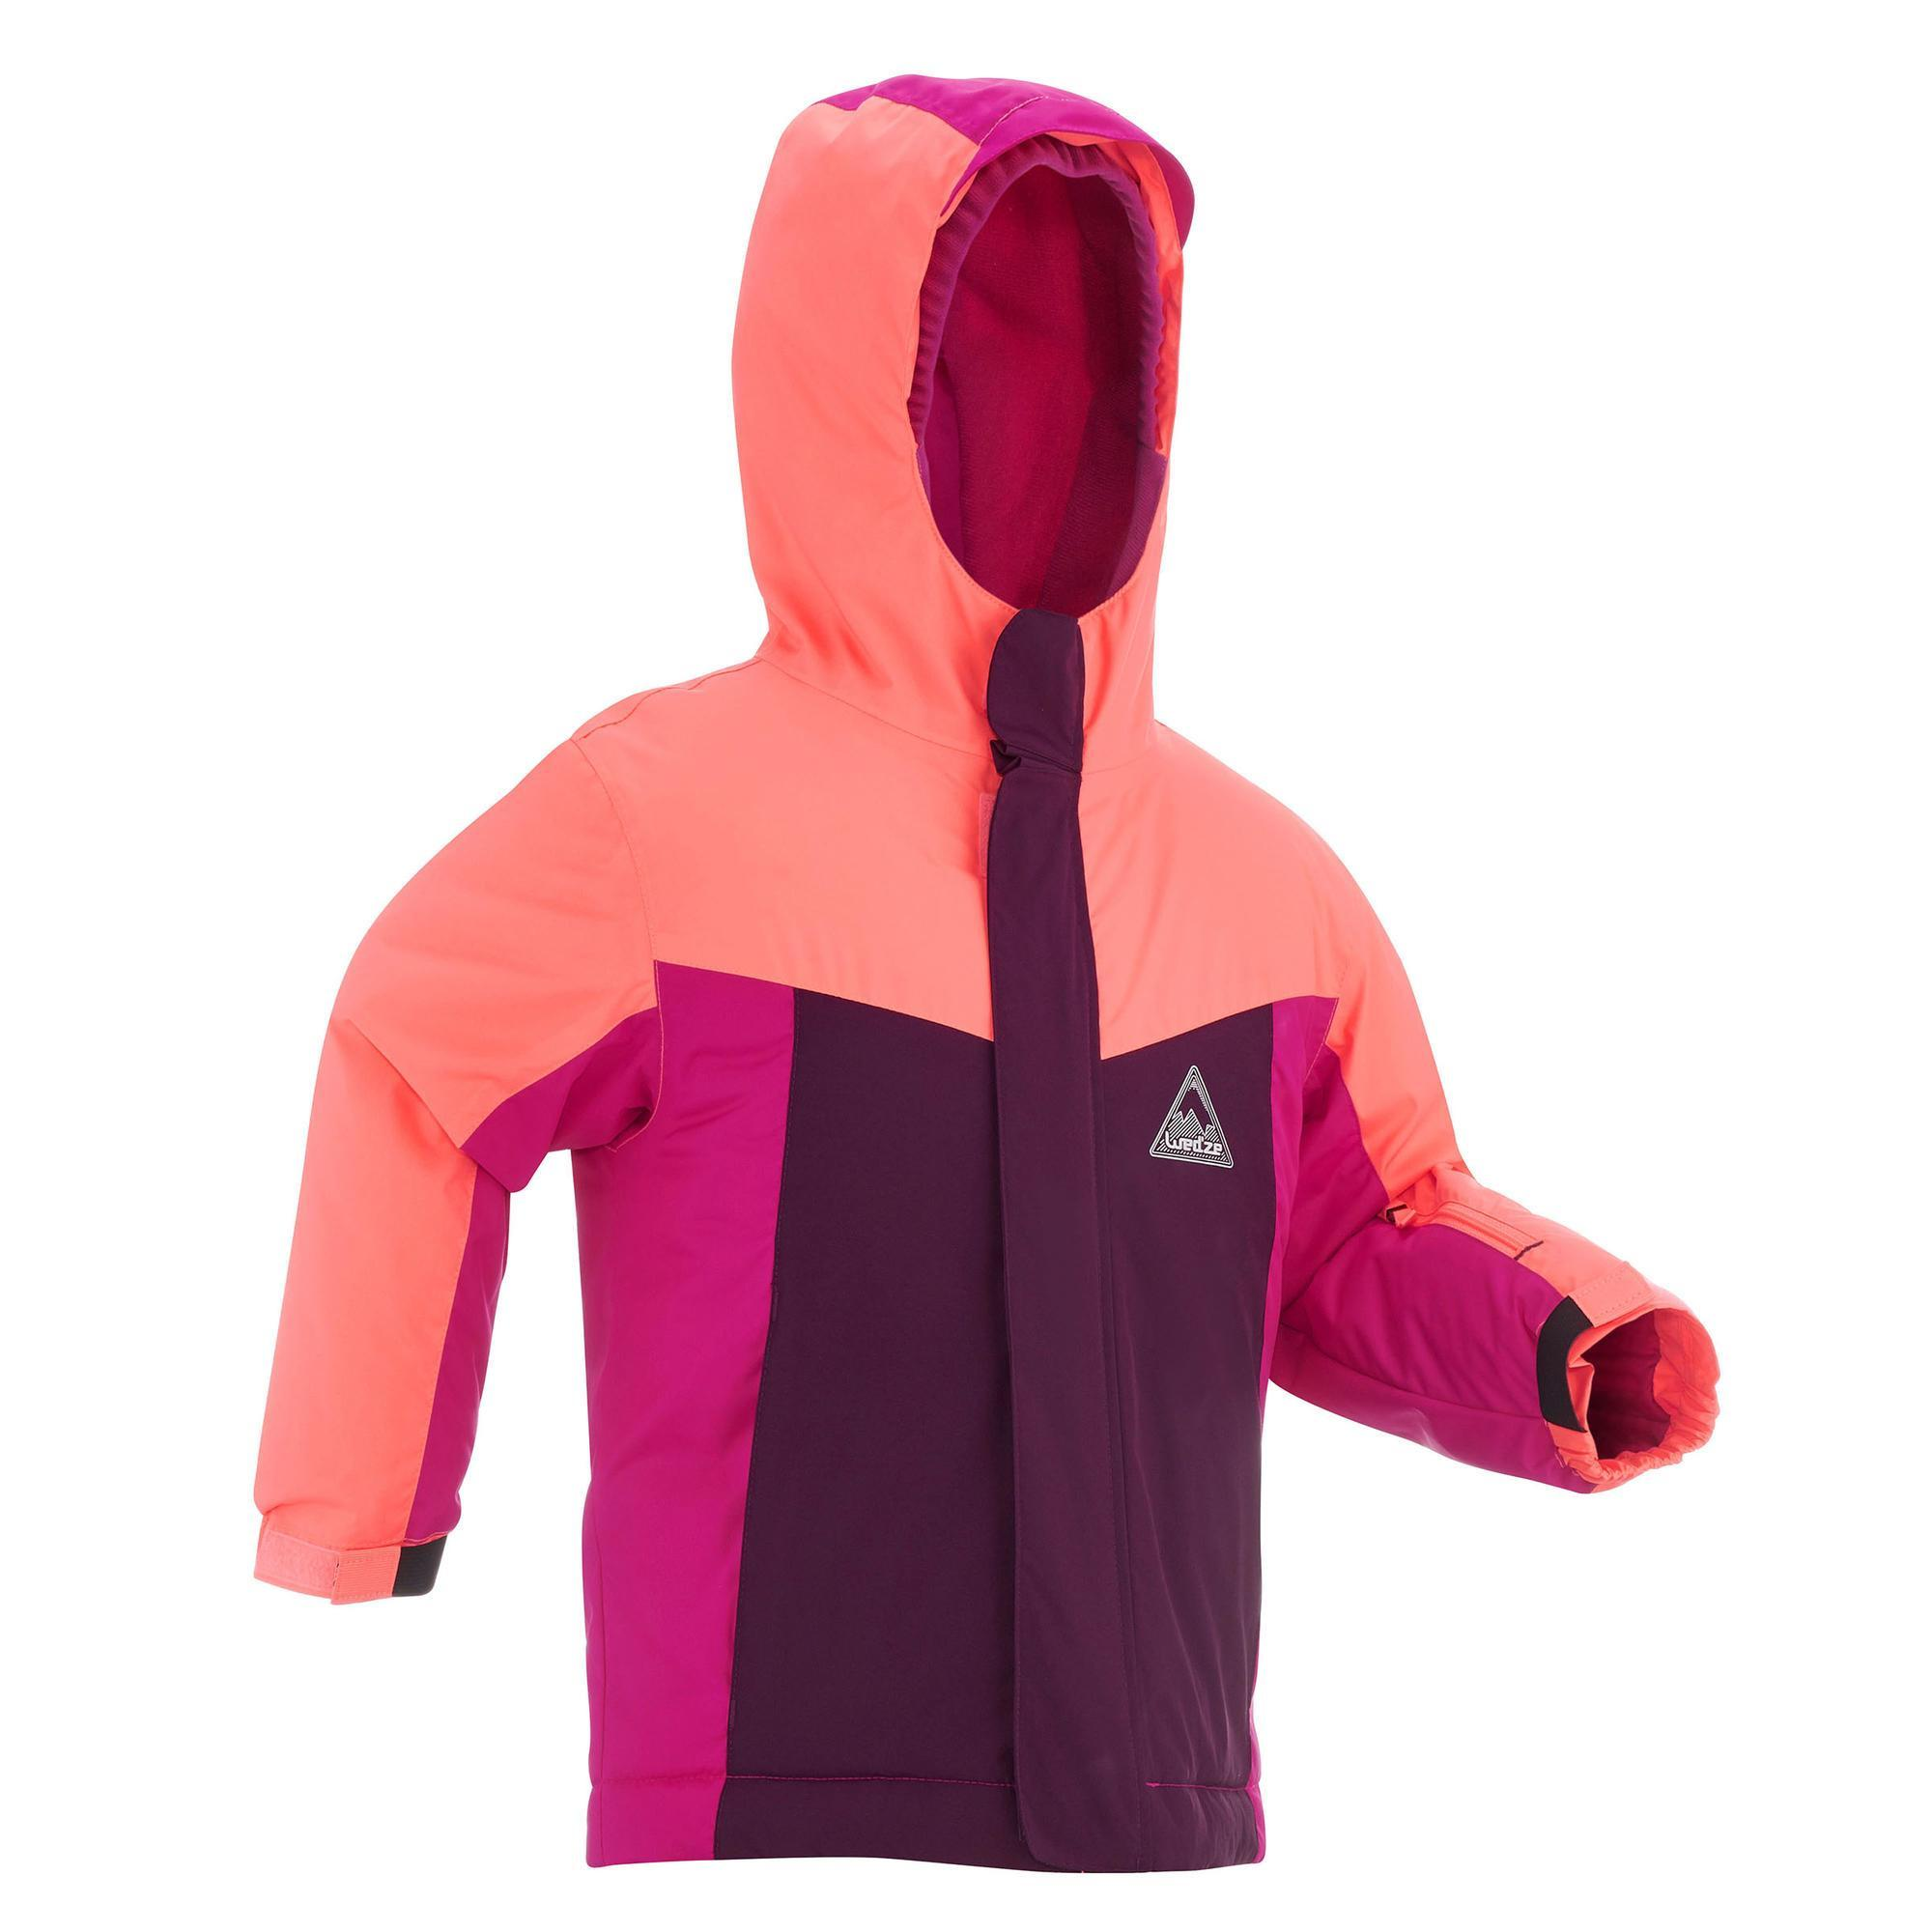 Jungen,Kinder Skijacke 500 PNF Kleinkinder rosa | 03608449863742